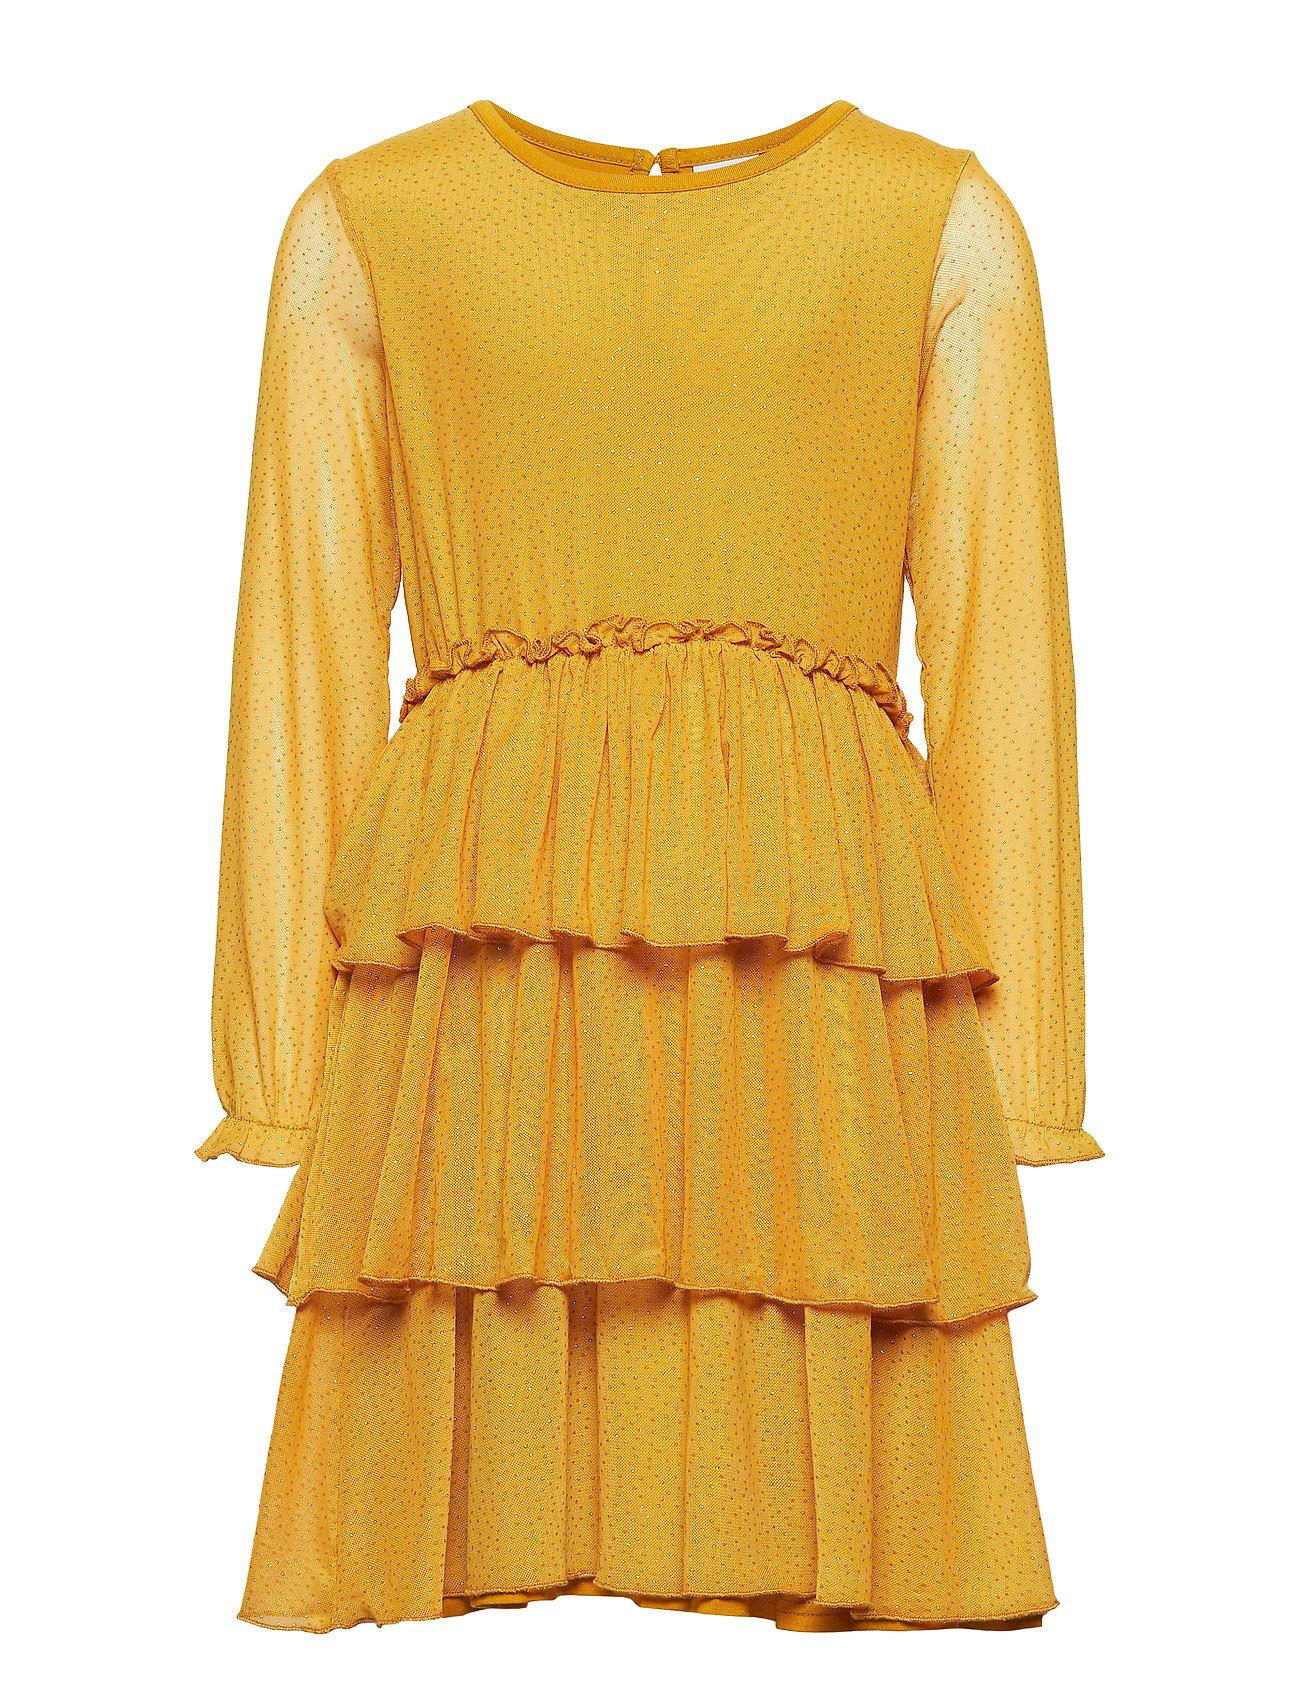 Image of Maise L_s Dress Kjole Gul The New (3215649351)